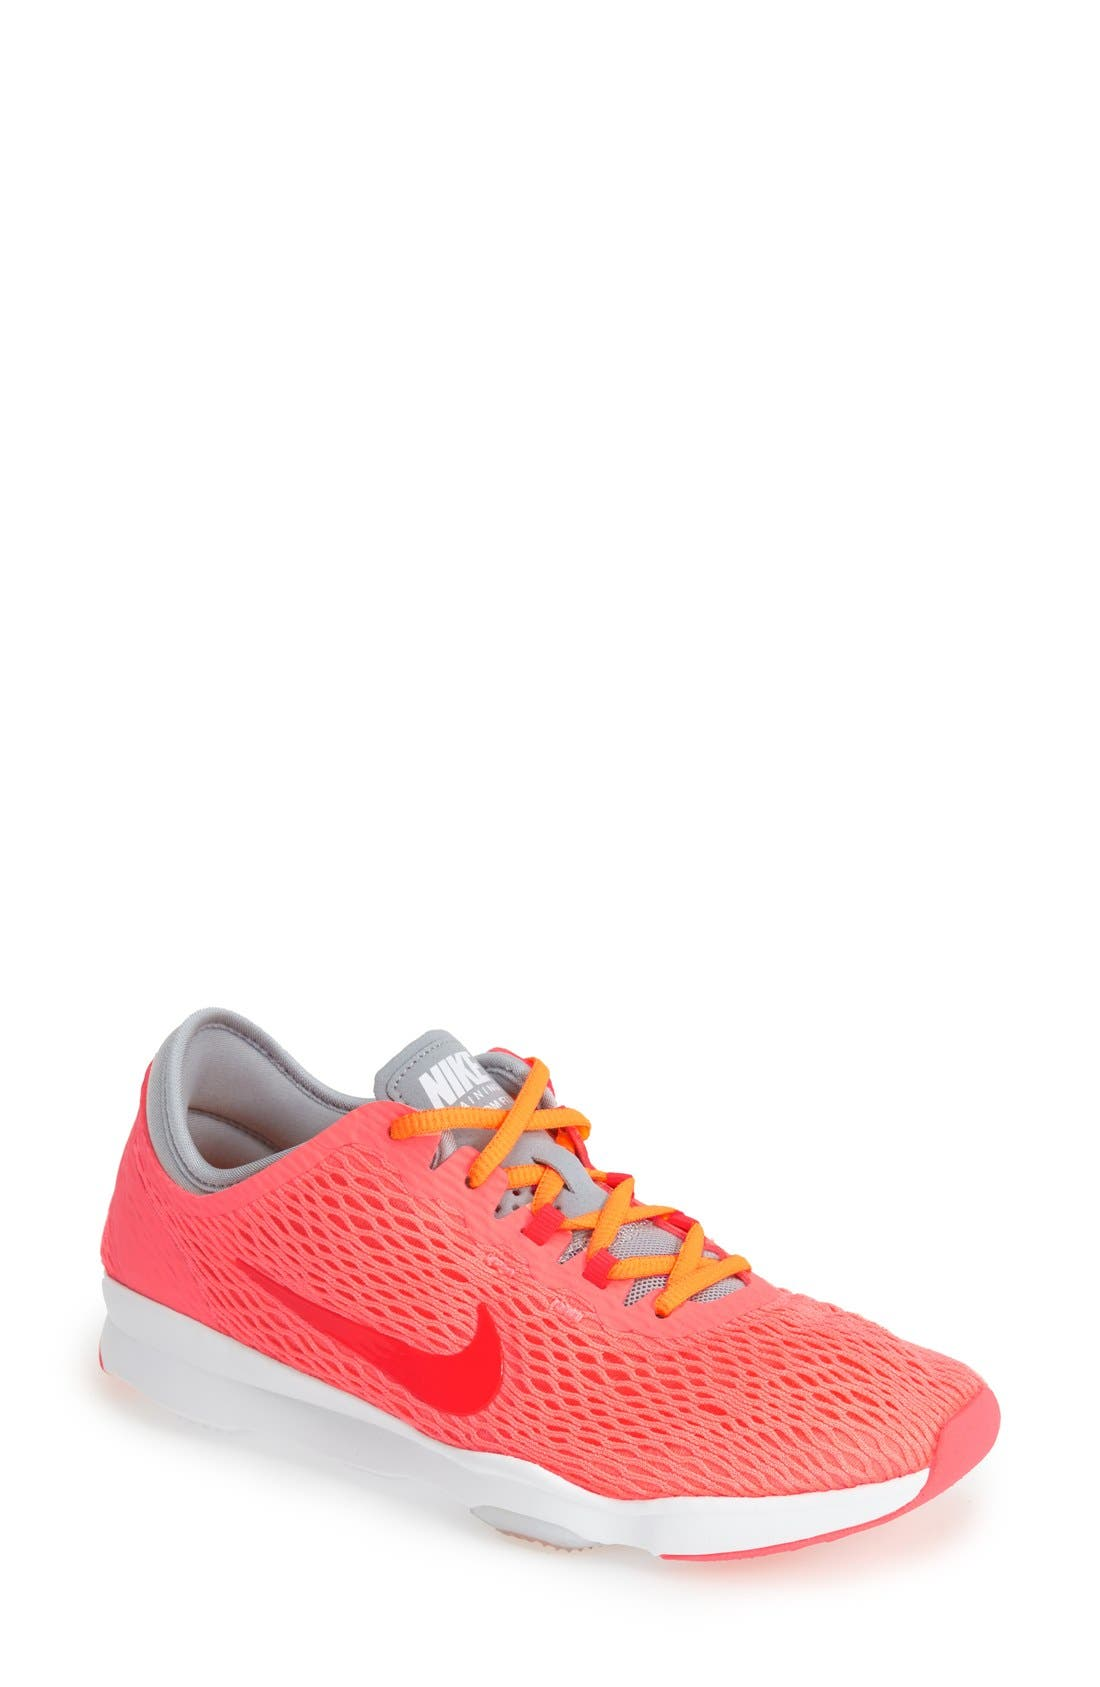 Alternate Image 1 Selected - Nike 'Zoom Fit' Mesh Training Shoe (Women)